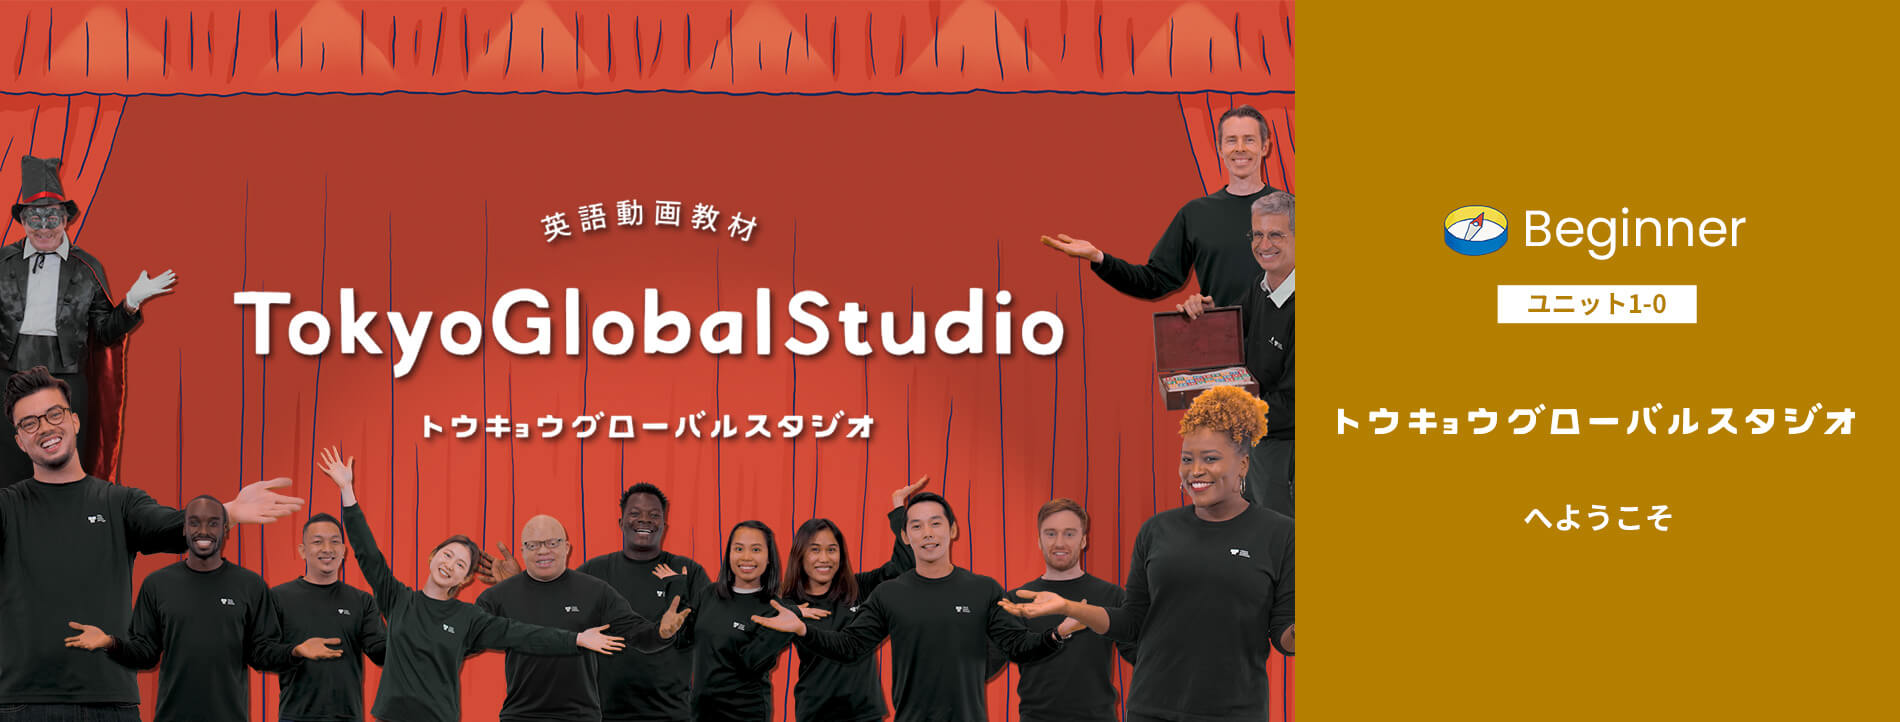 Beginner ユニット1-0トウキョウグローバルスタジオへようこそ